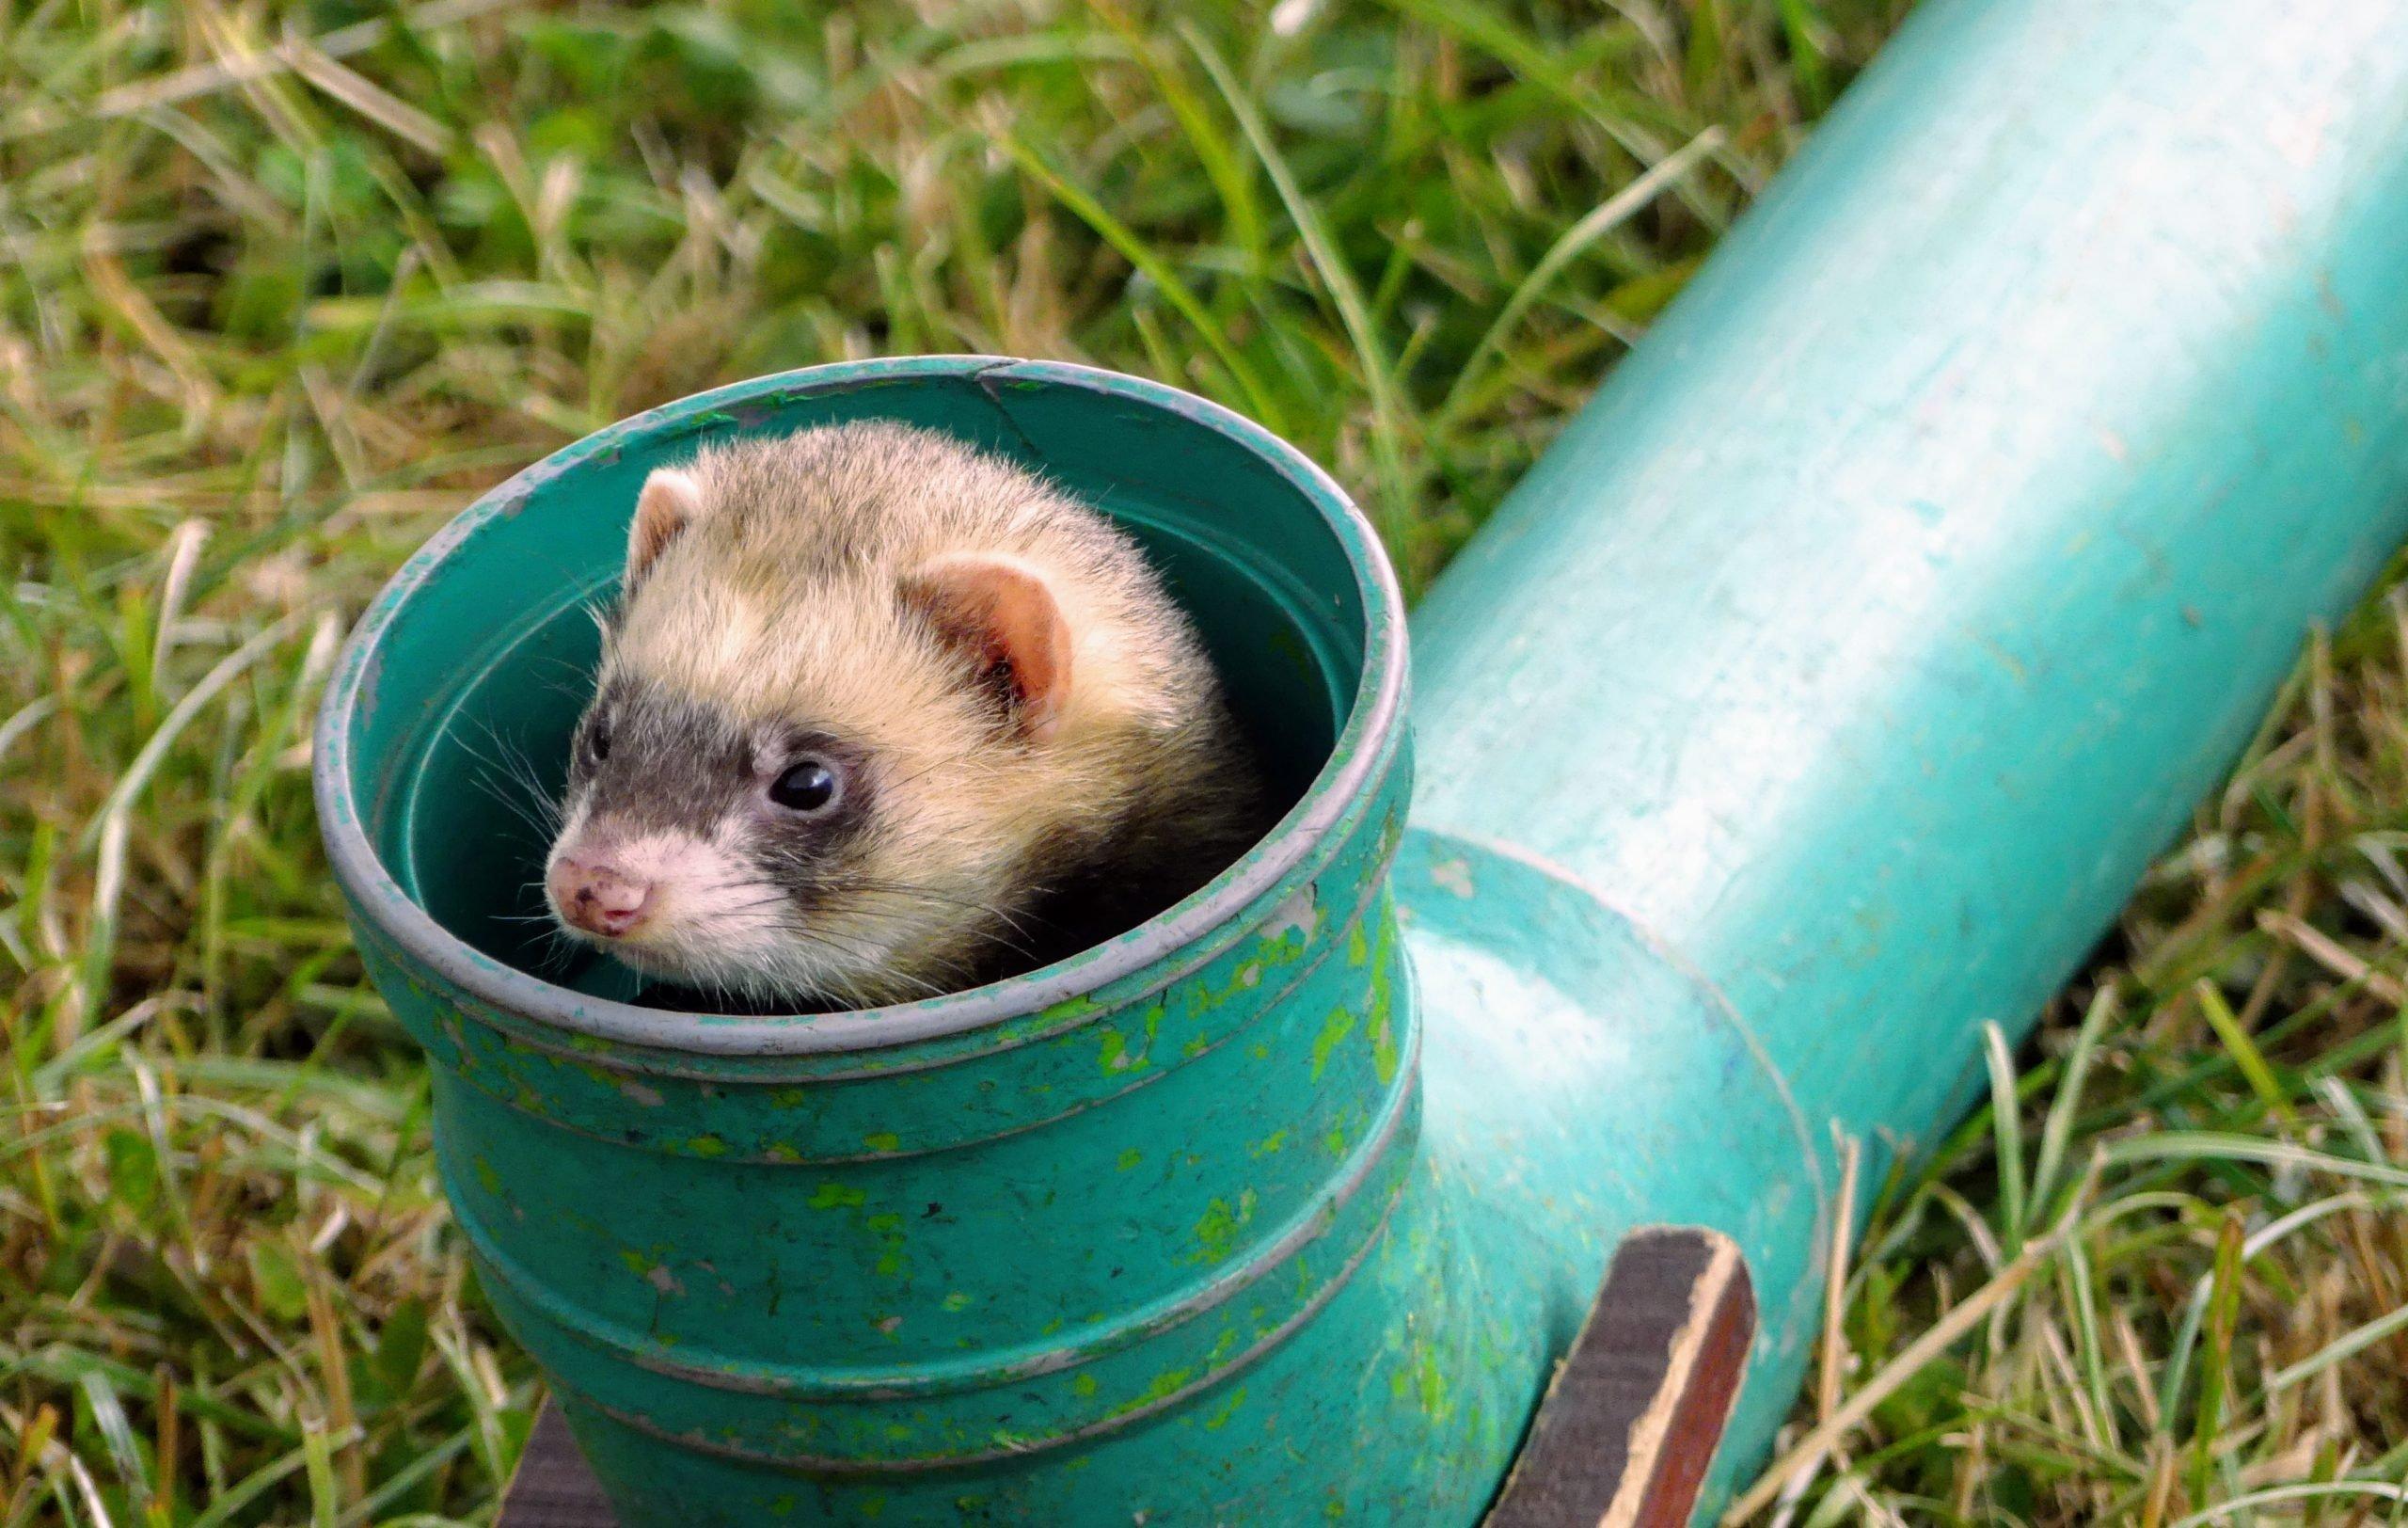 A ferret peers out of a pipe, ferret racing. Ferret, Mustela putorius